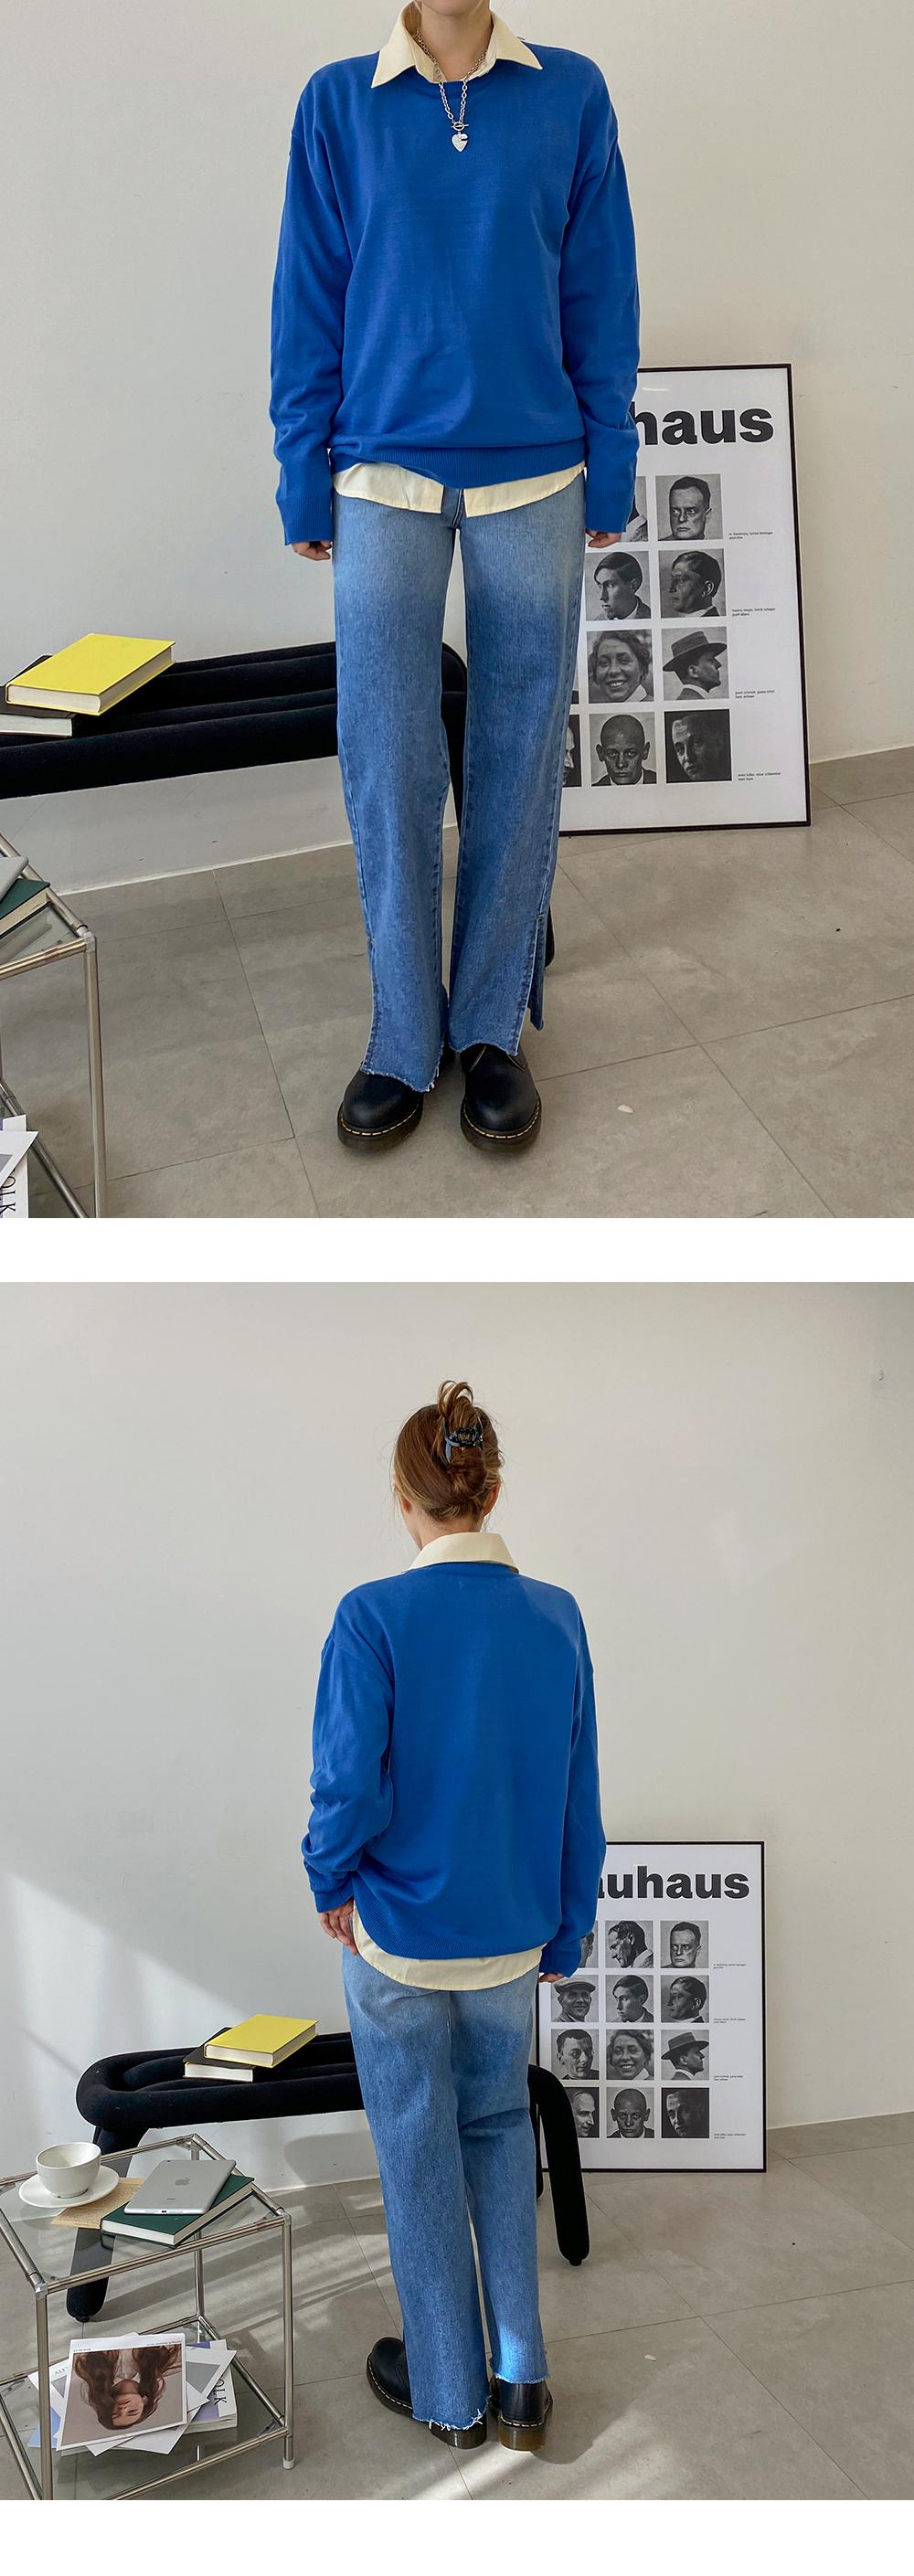 Harris Round Overfit Knitwear